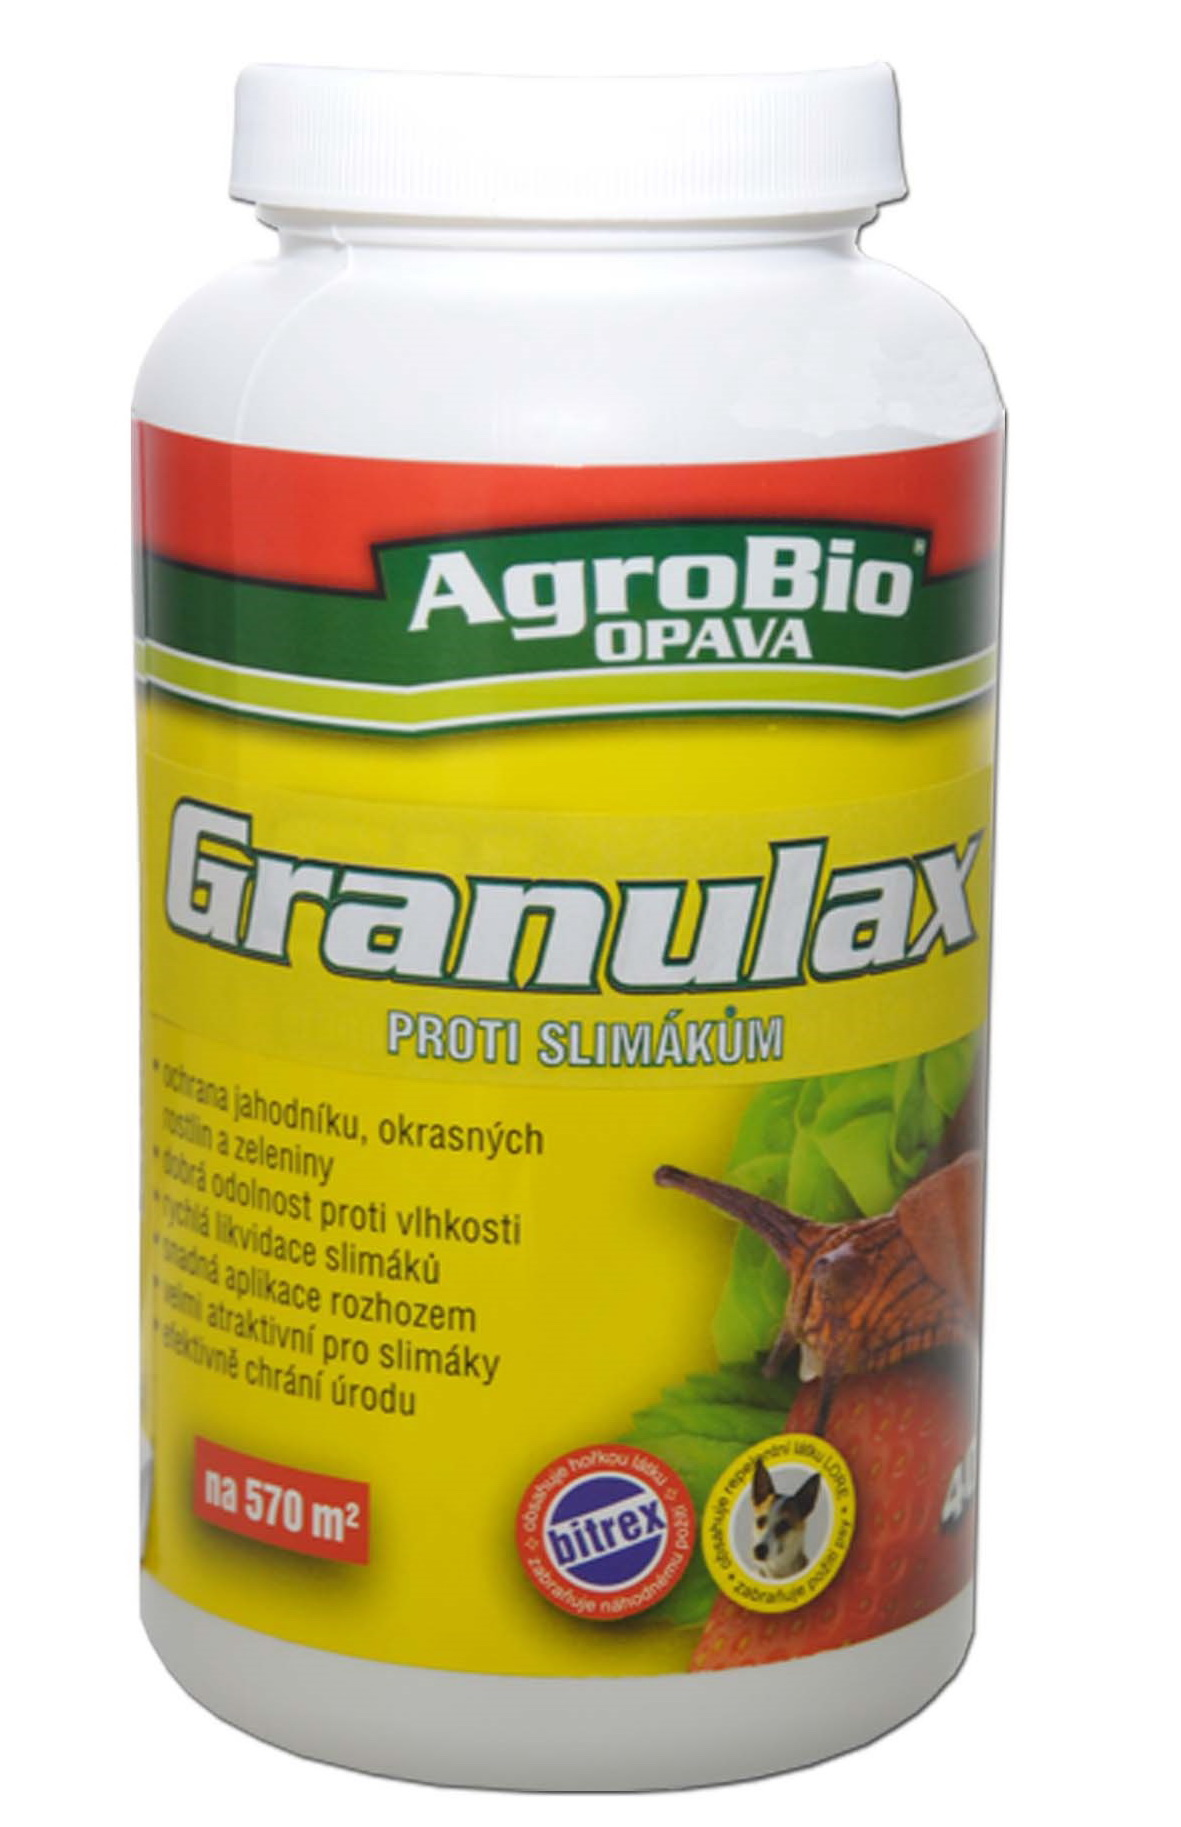 Granulax 250g (dříve Slimax)